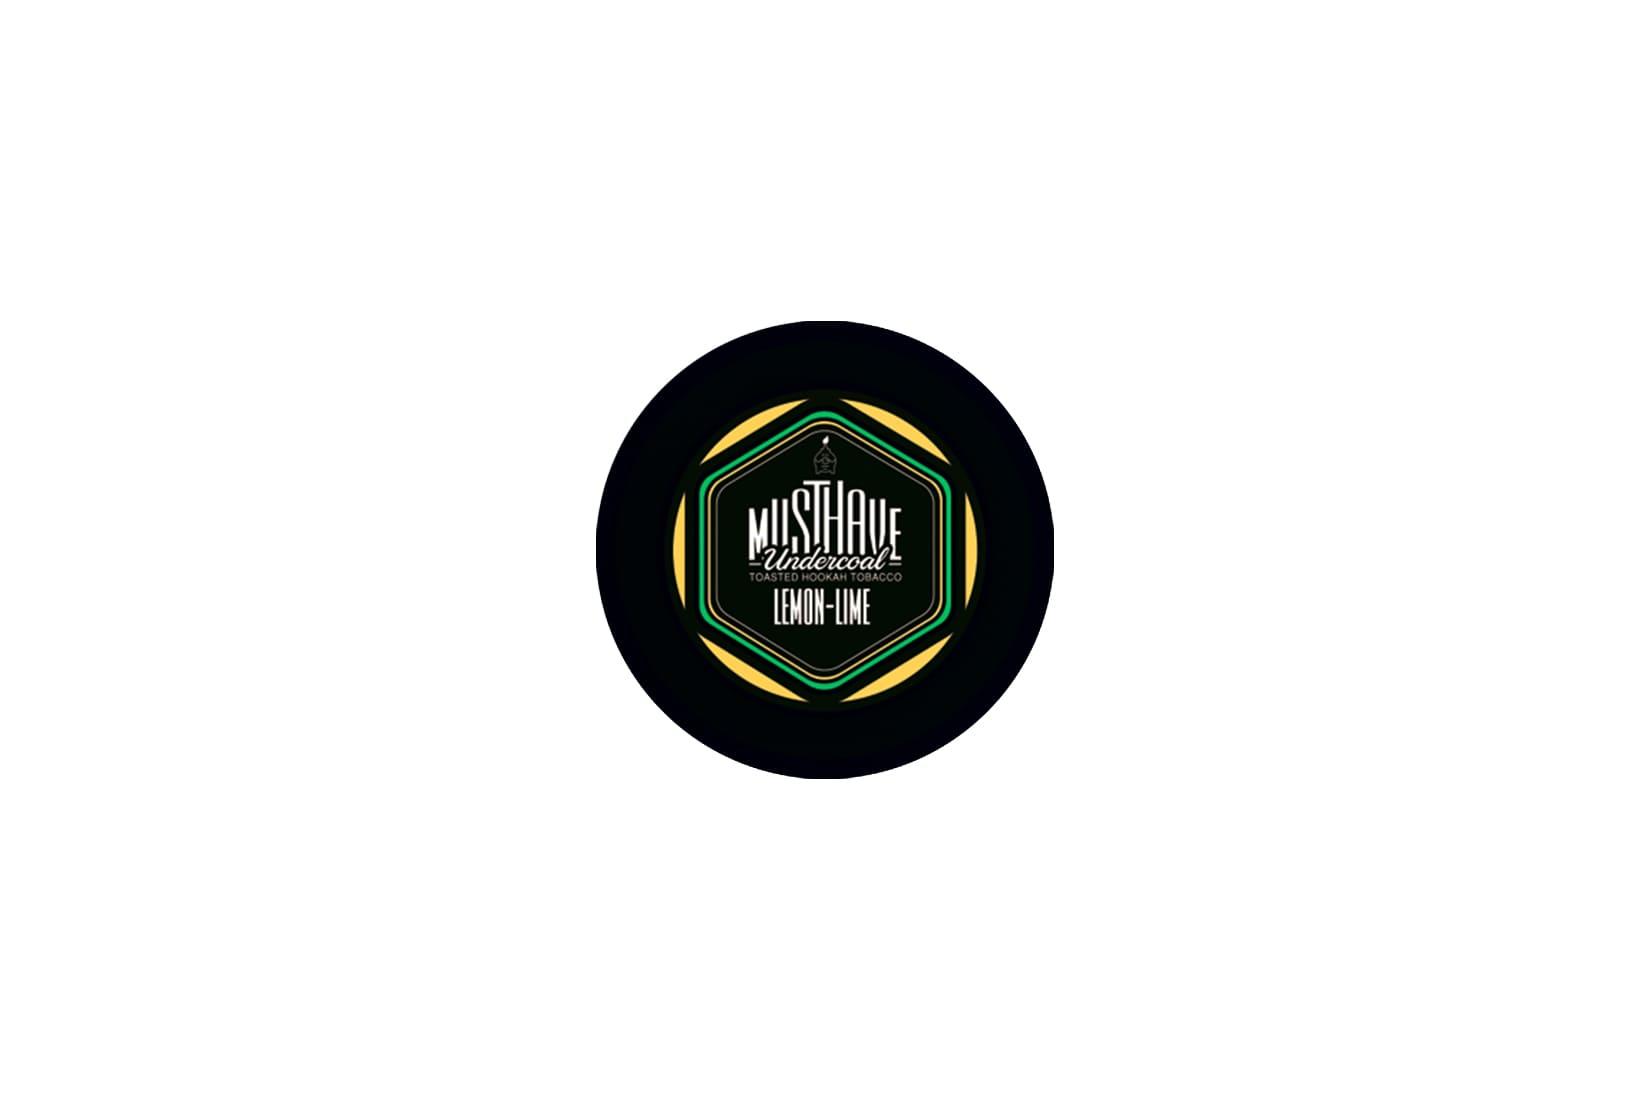 Табак для кальяна MustHave Lemon Lime – описание, миксы, отзывы